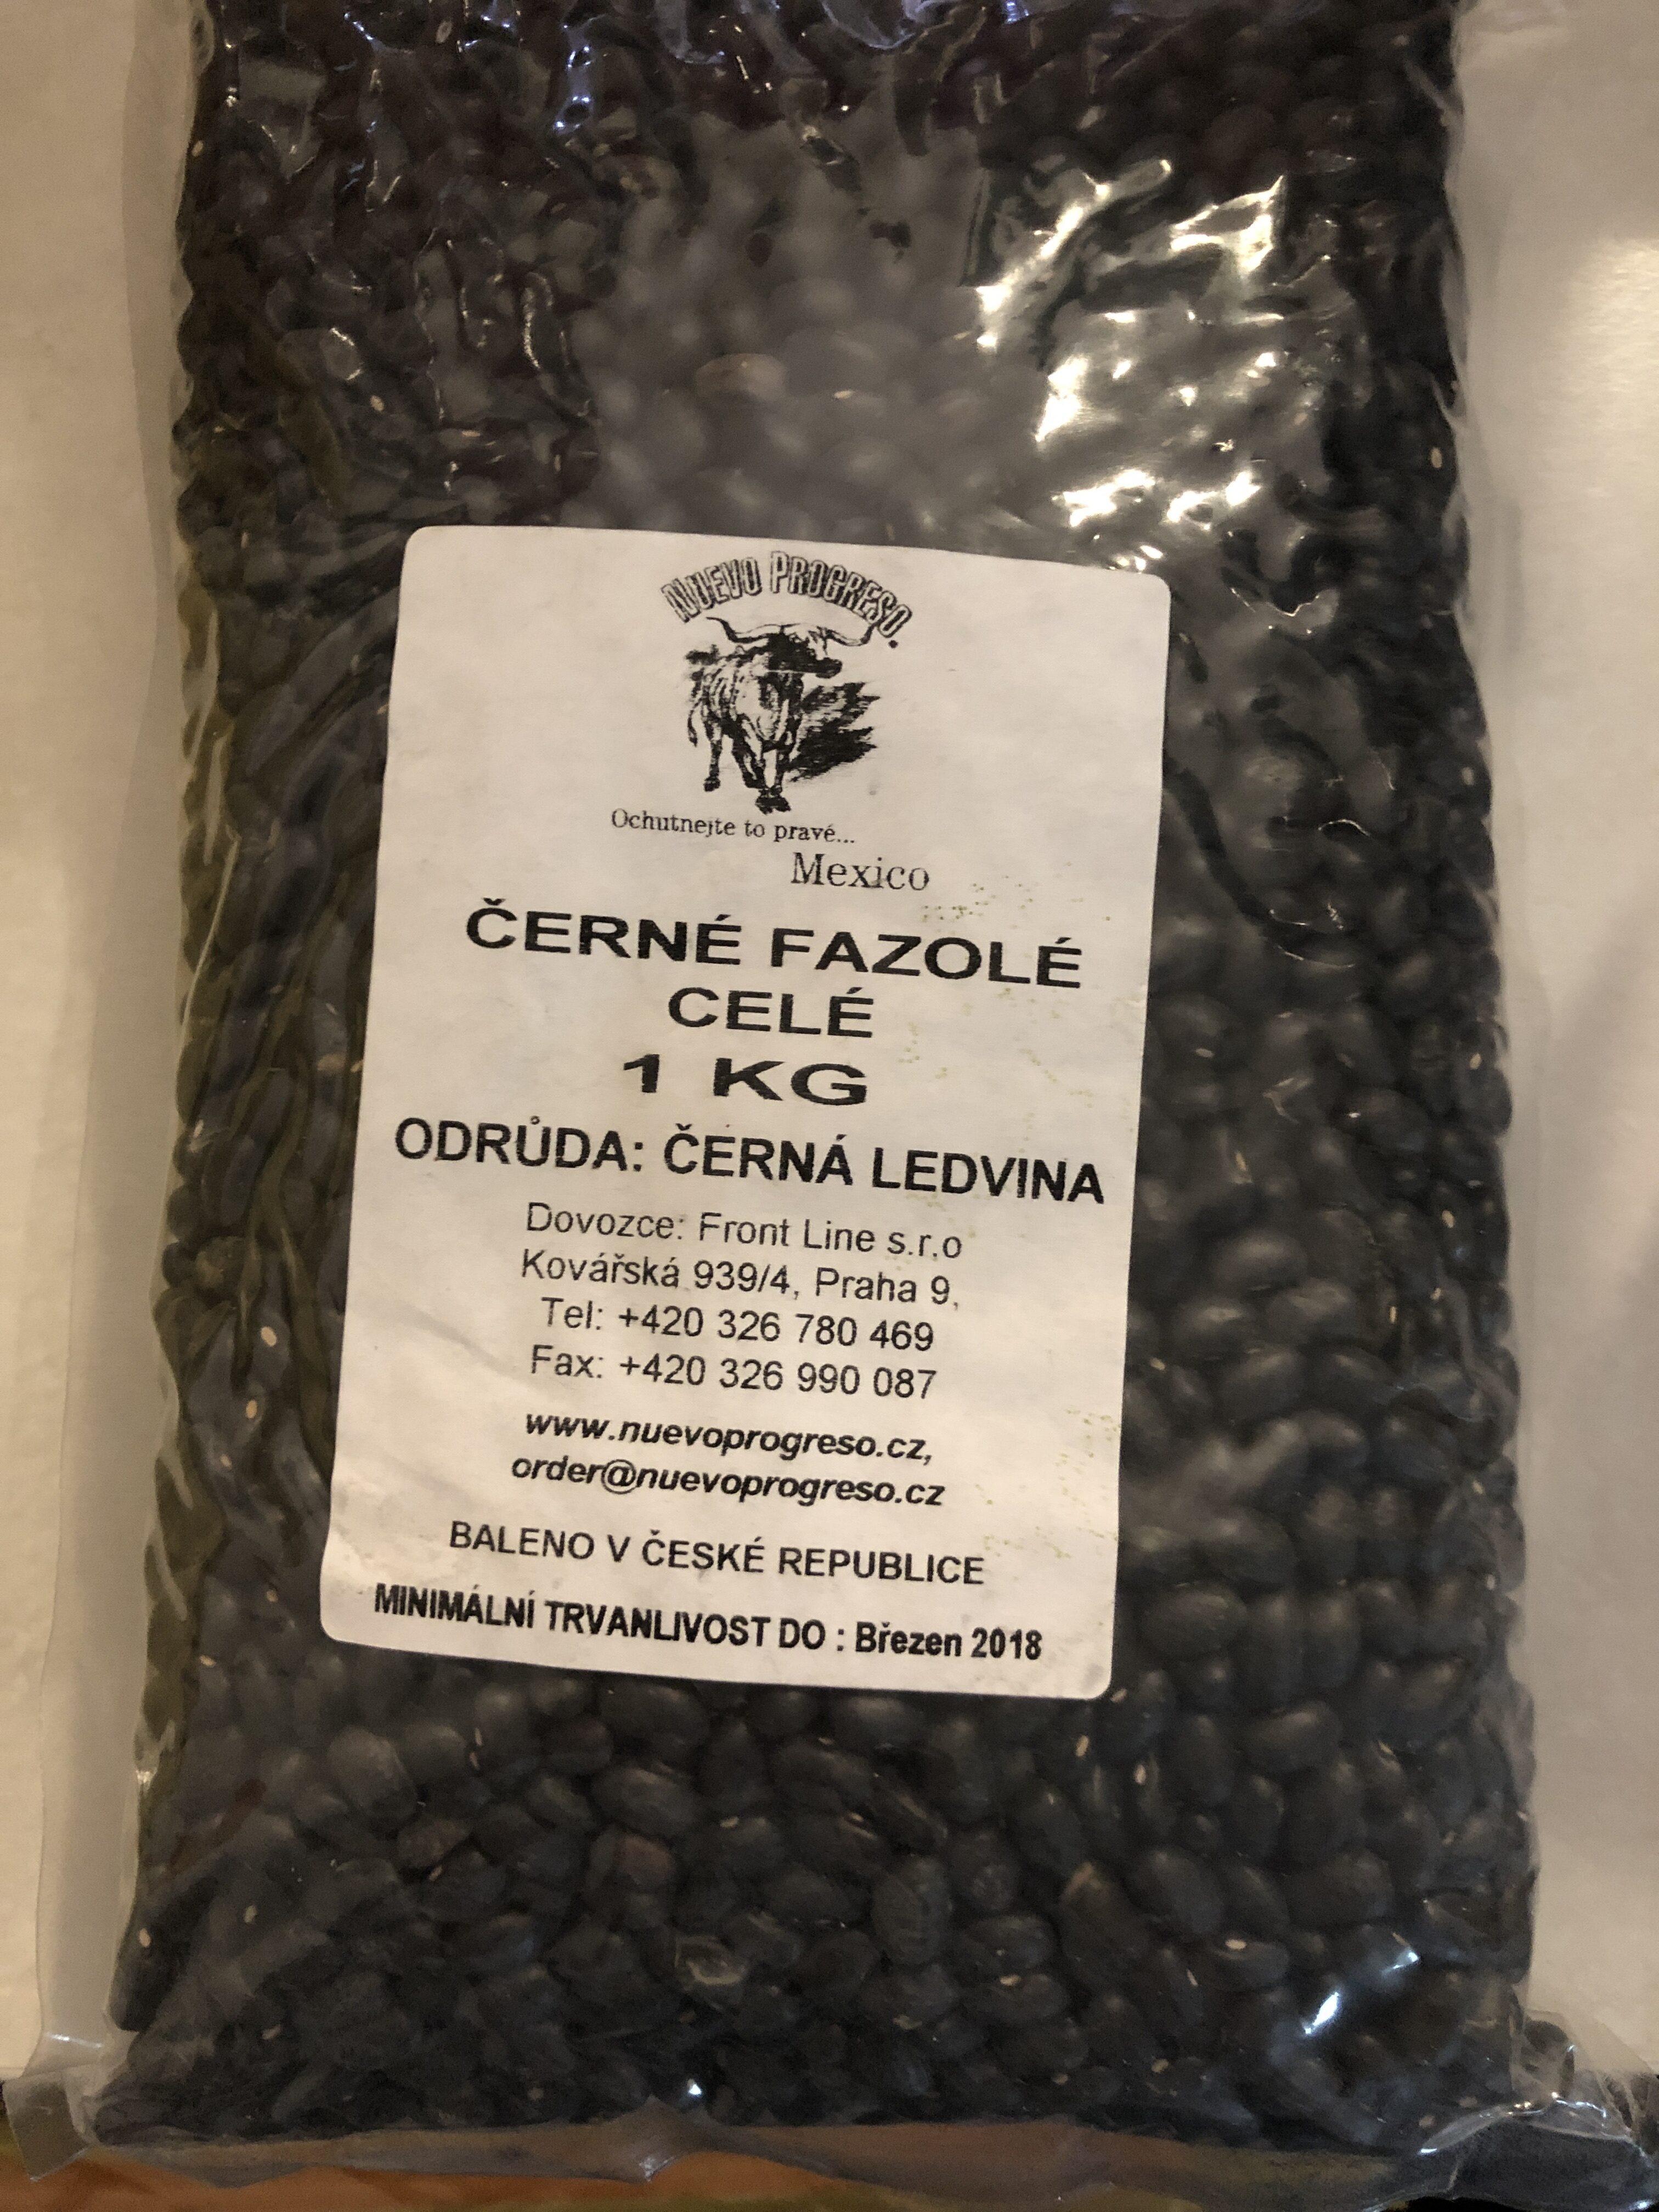 Černé fazolé - Product - en